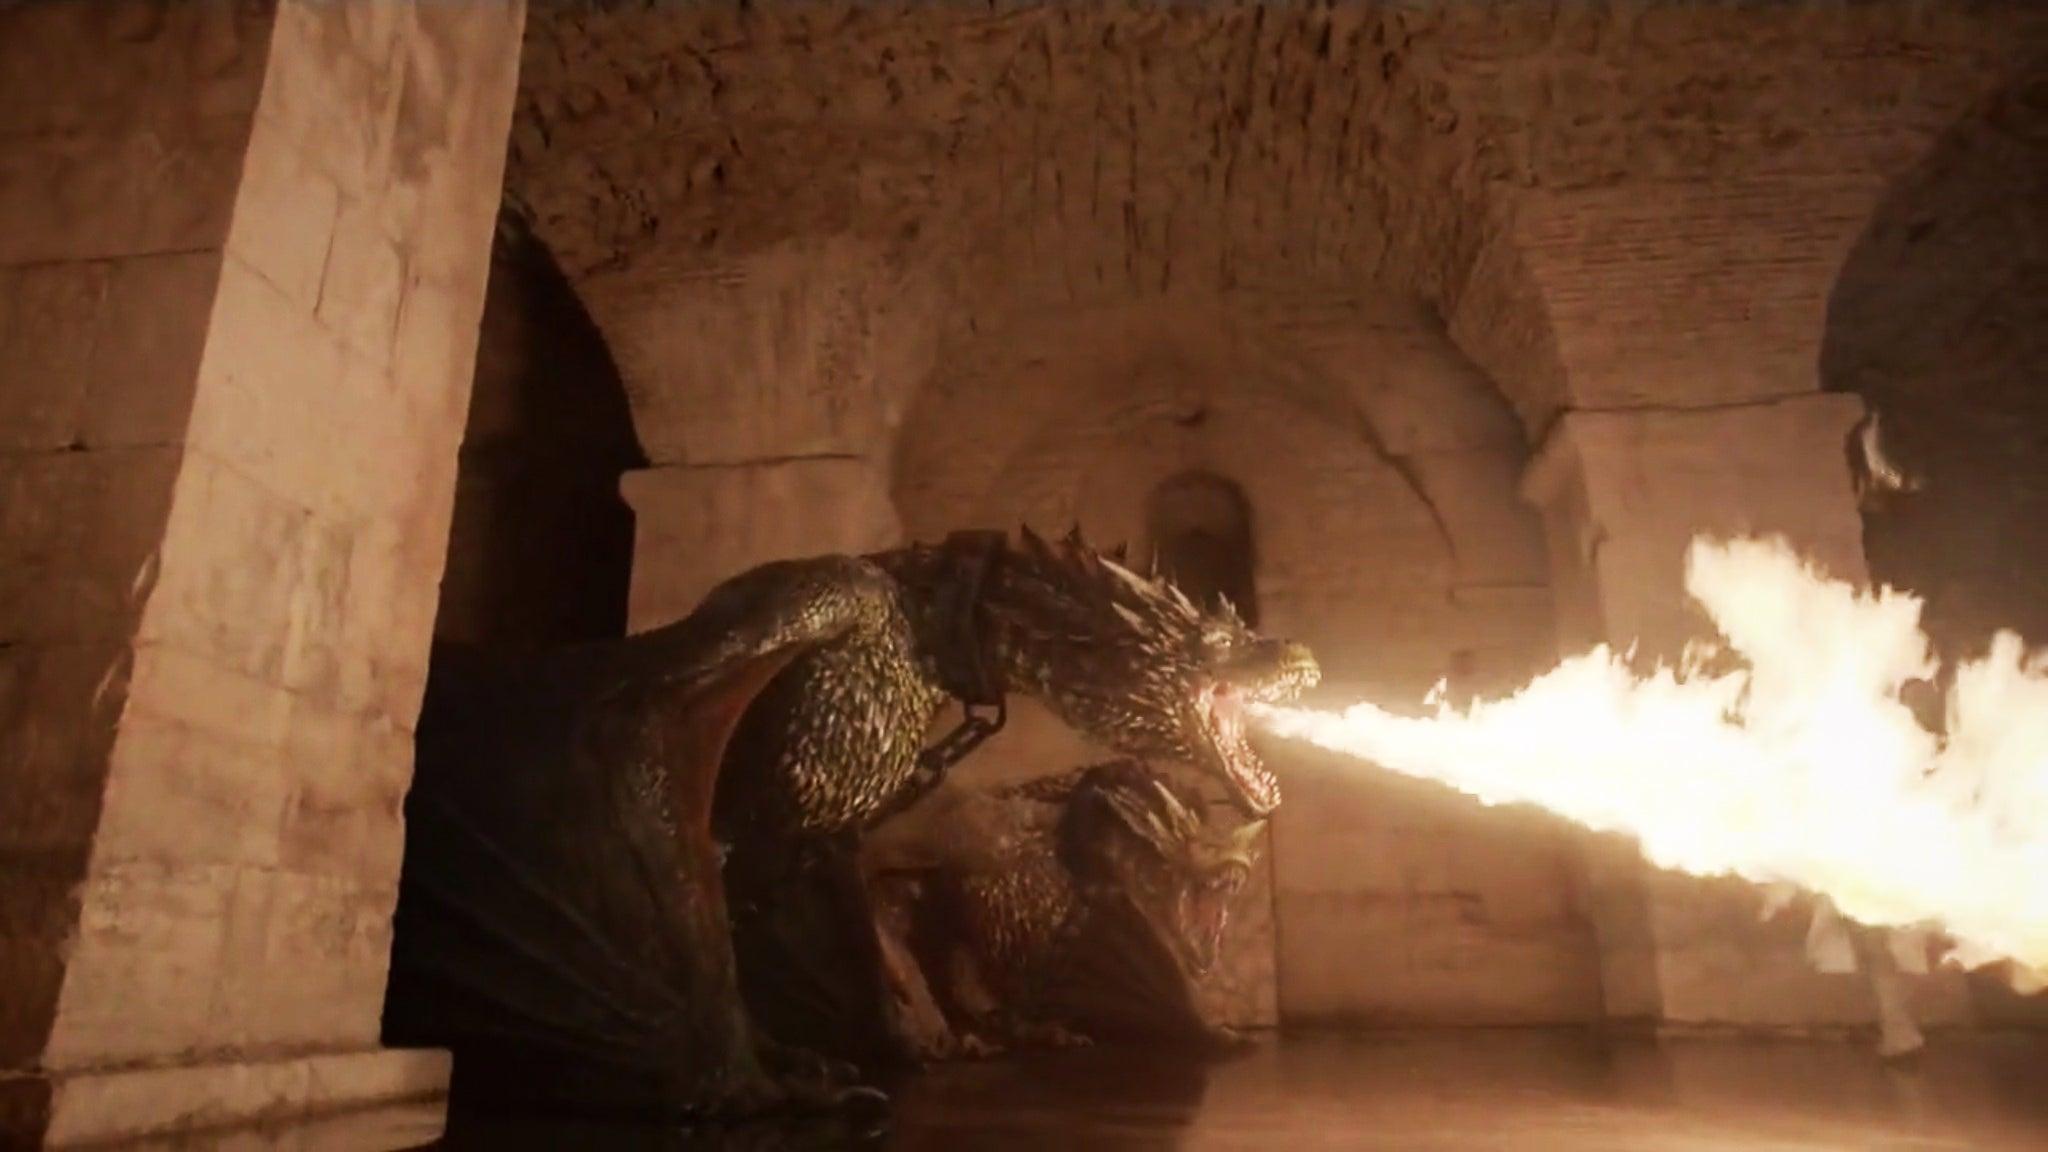 Targaryen Wallpaper Smartphone: Game Of Thrones Season 6 Spoilers: It Looks Like Drogon